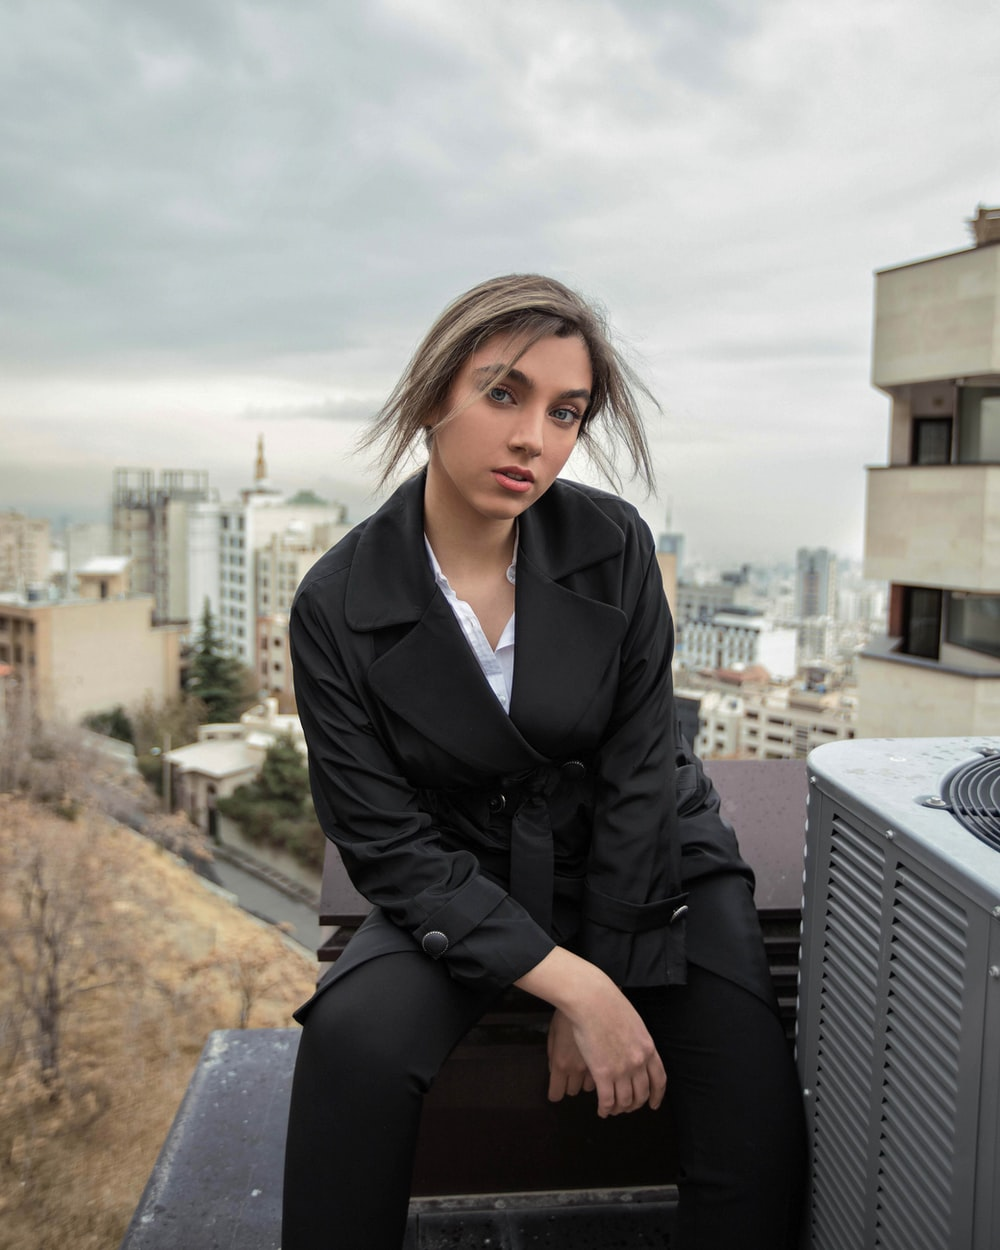 woman in black blazer sitting on concrete bench during daytime